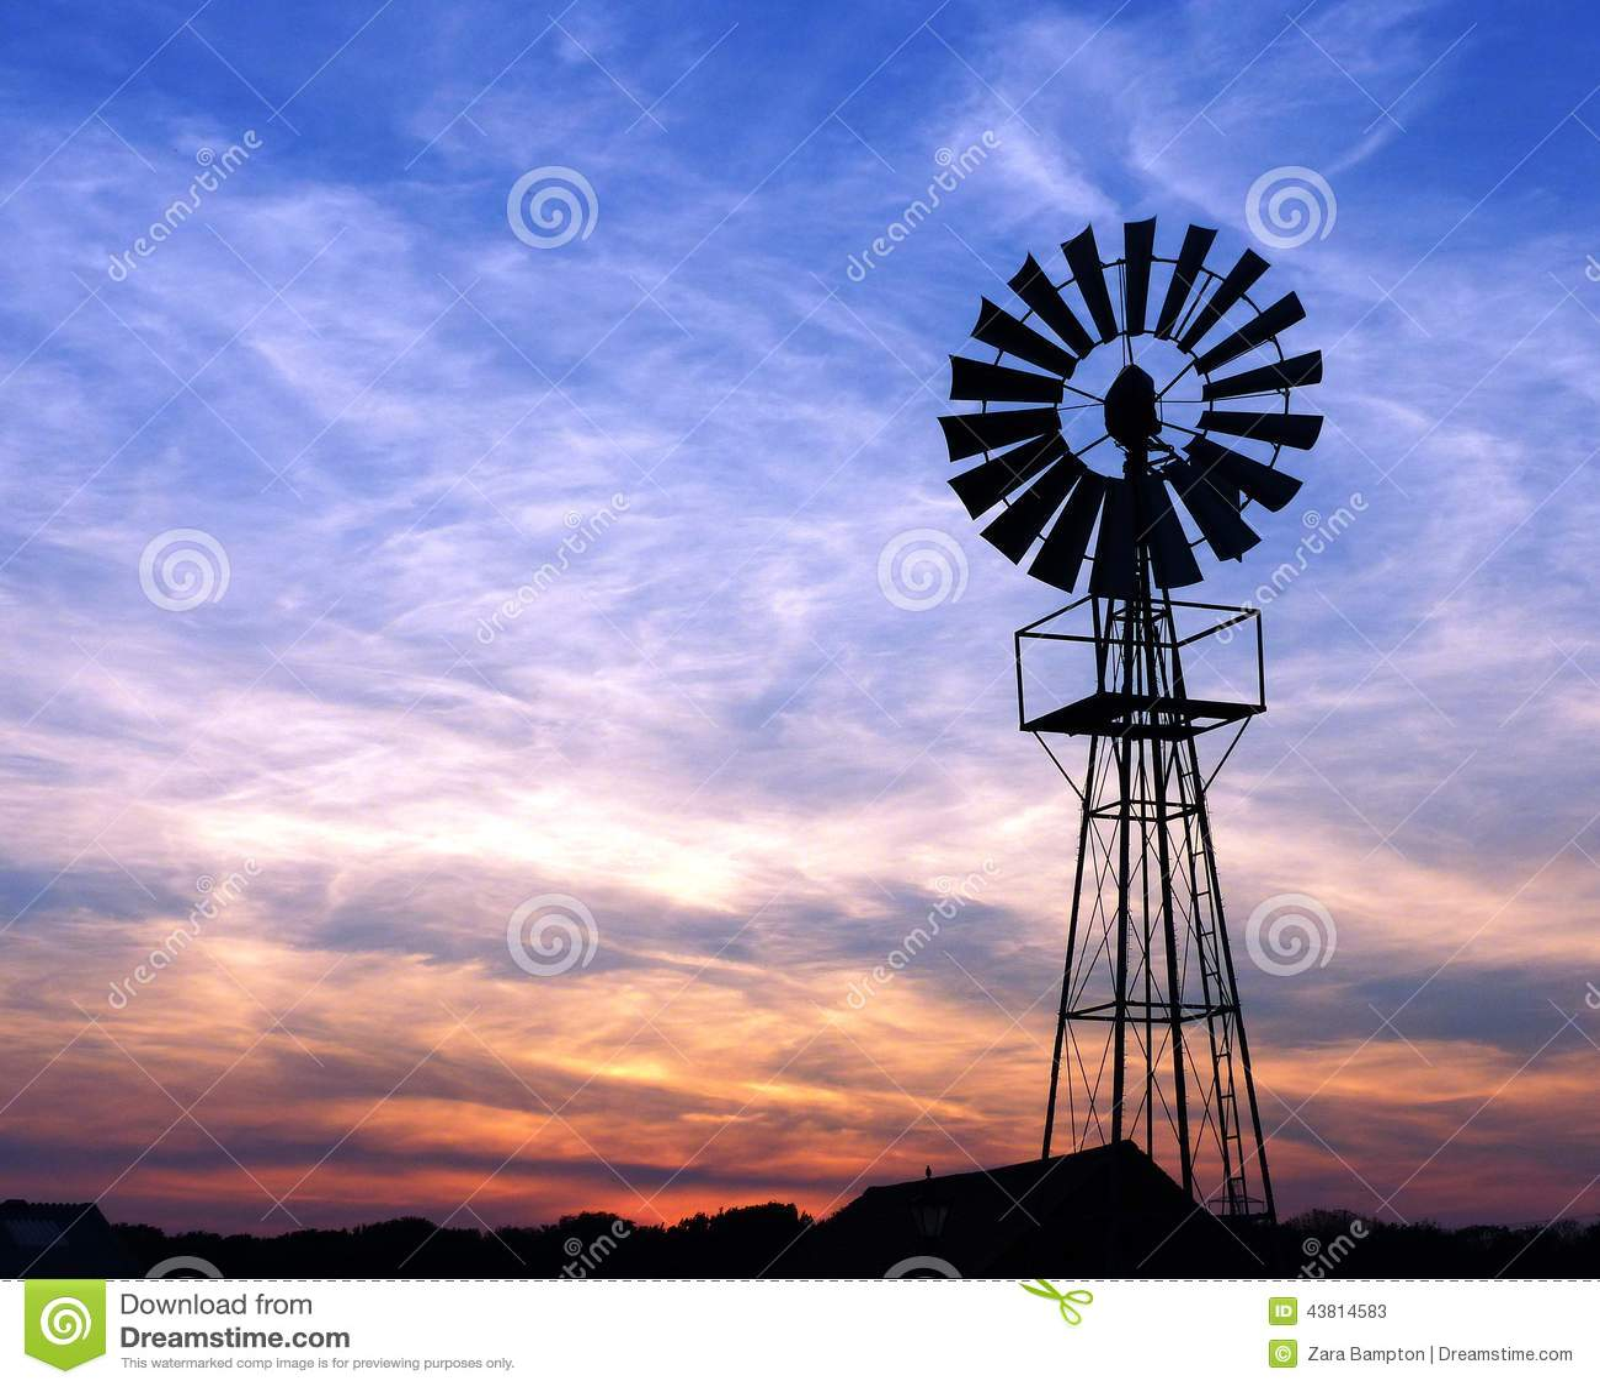 Windmill At Sunset Stock Photo - Image: 43814583